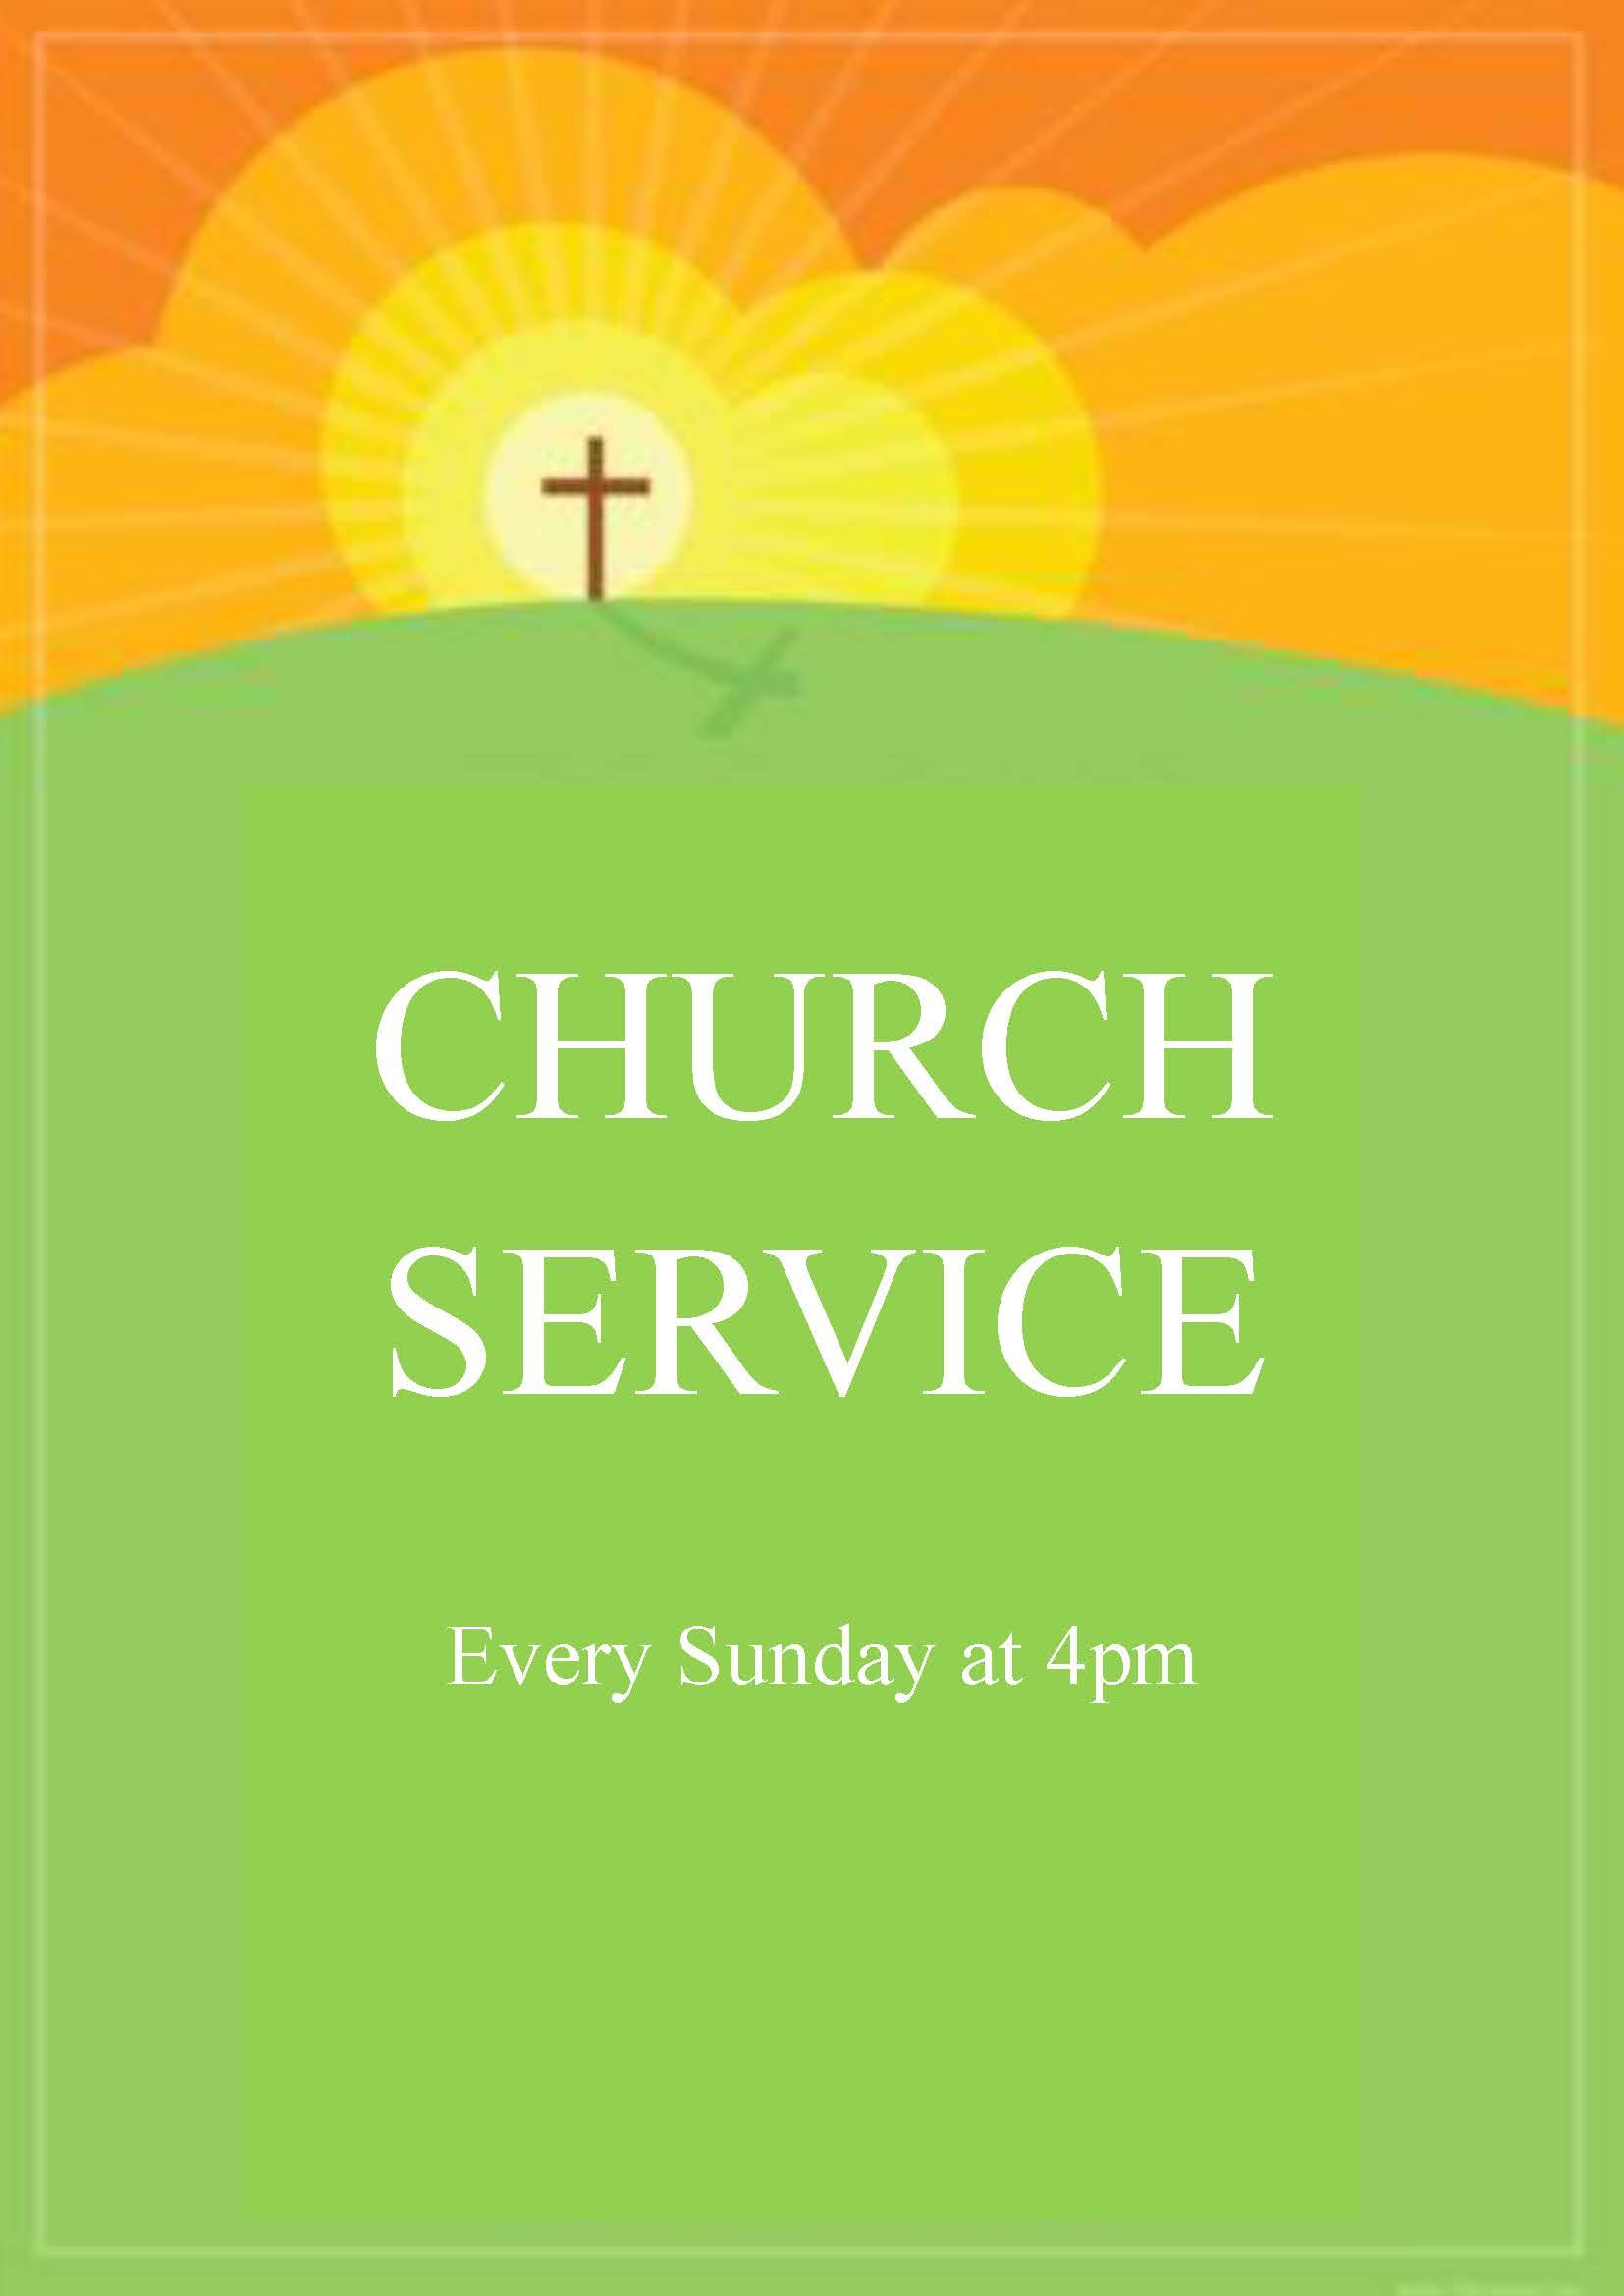 Church service poster